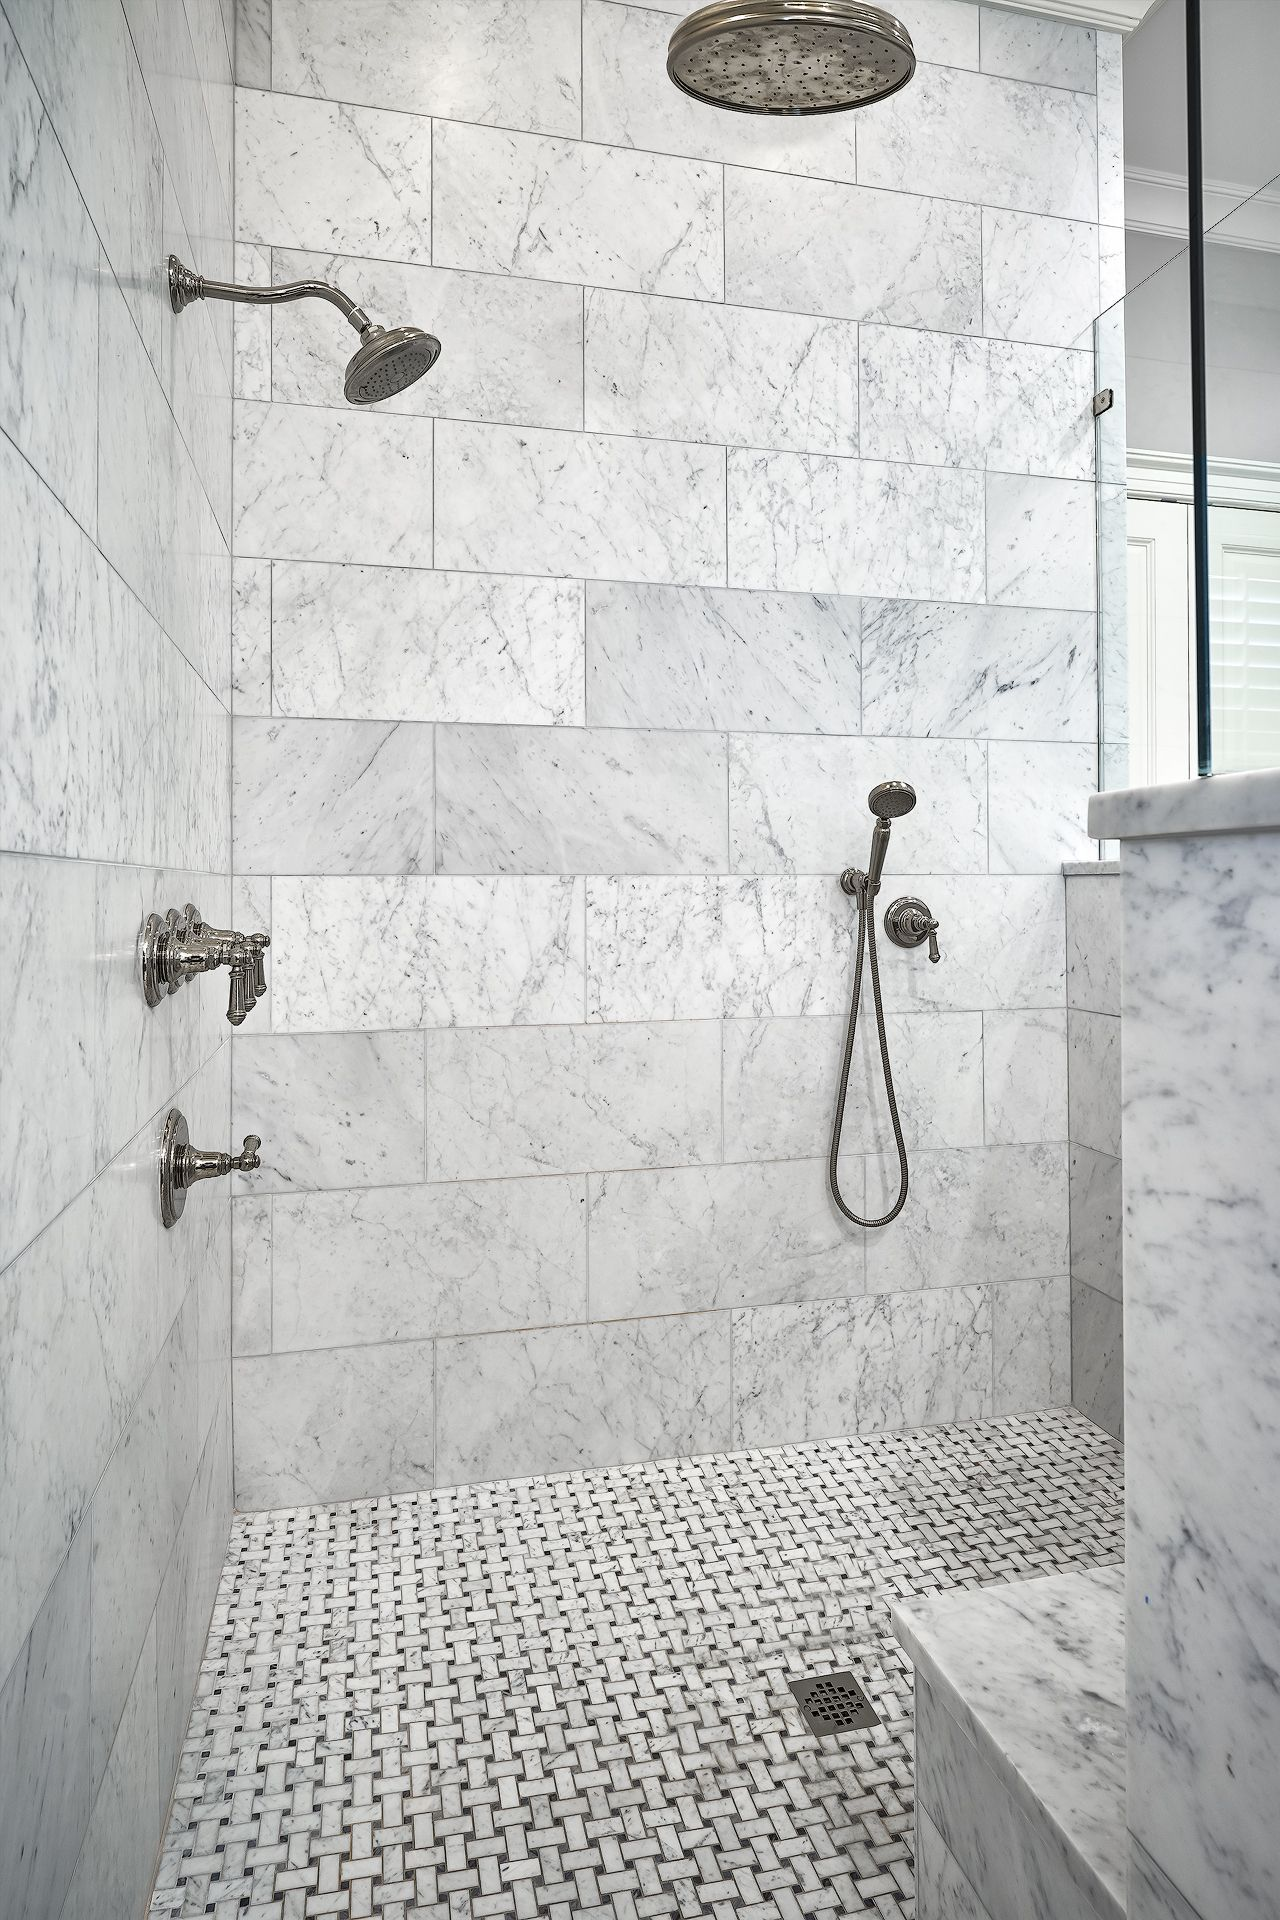 10 Amazing Subway Tile Bathroom Ideas - Home Inspirations | Large ...